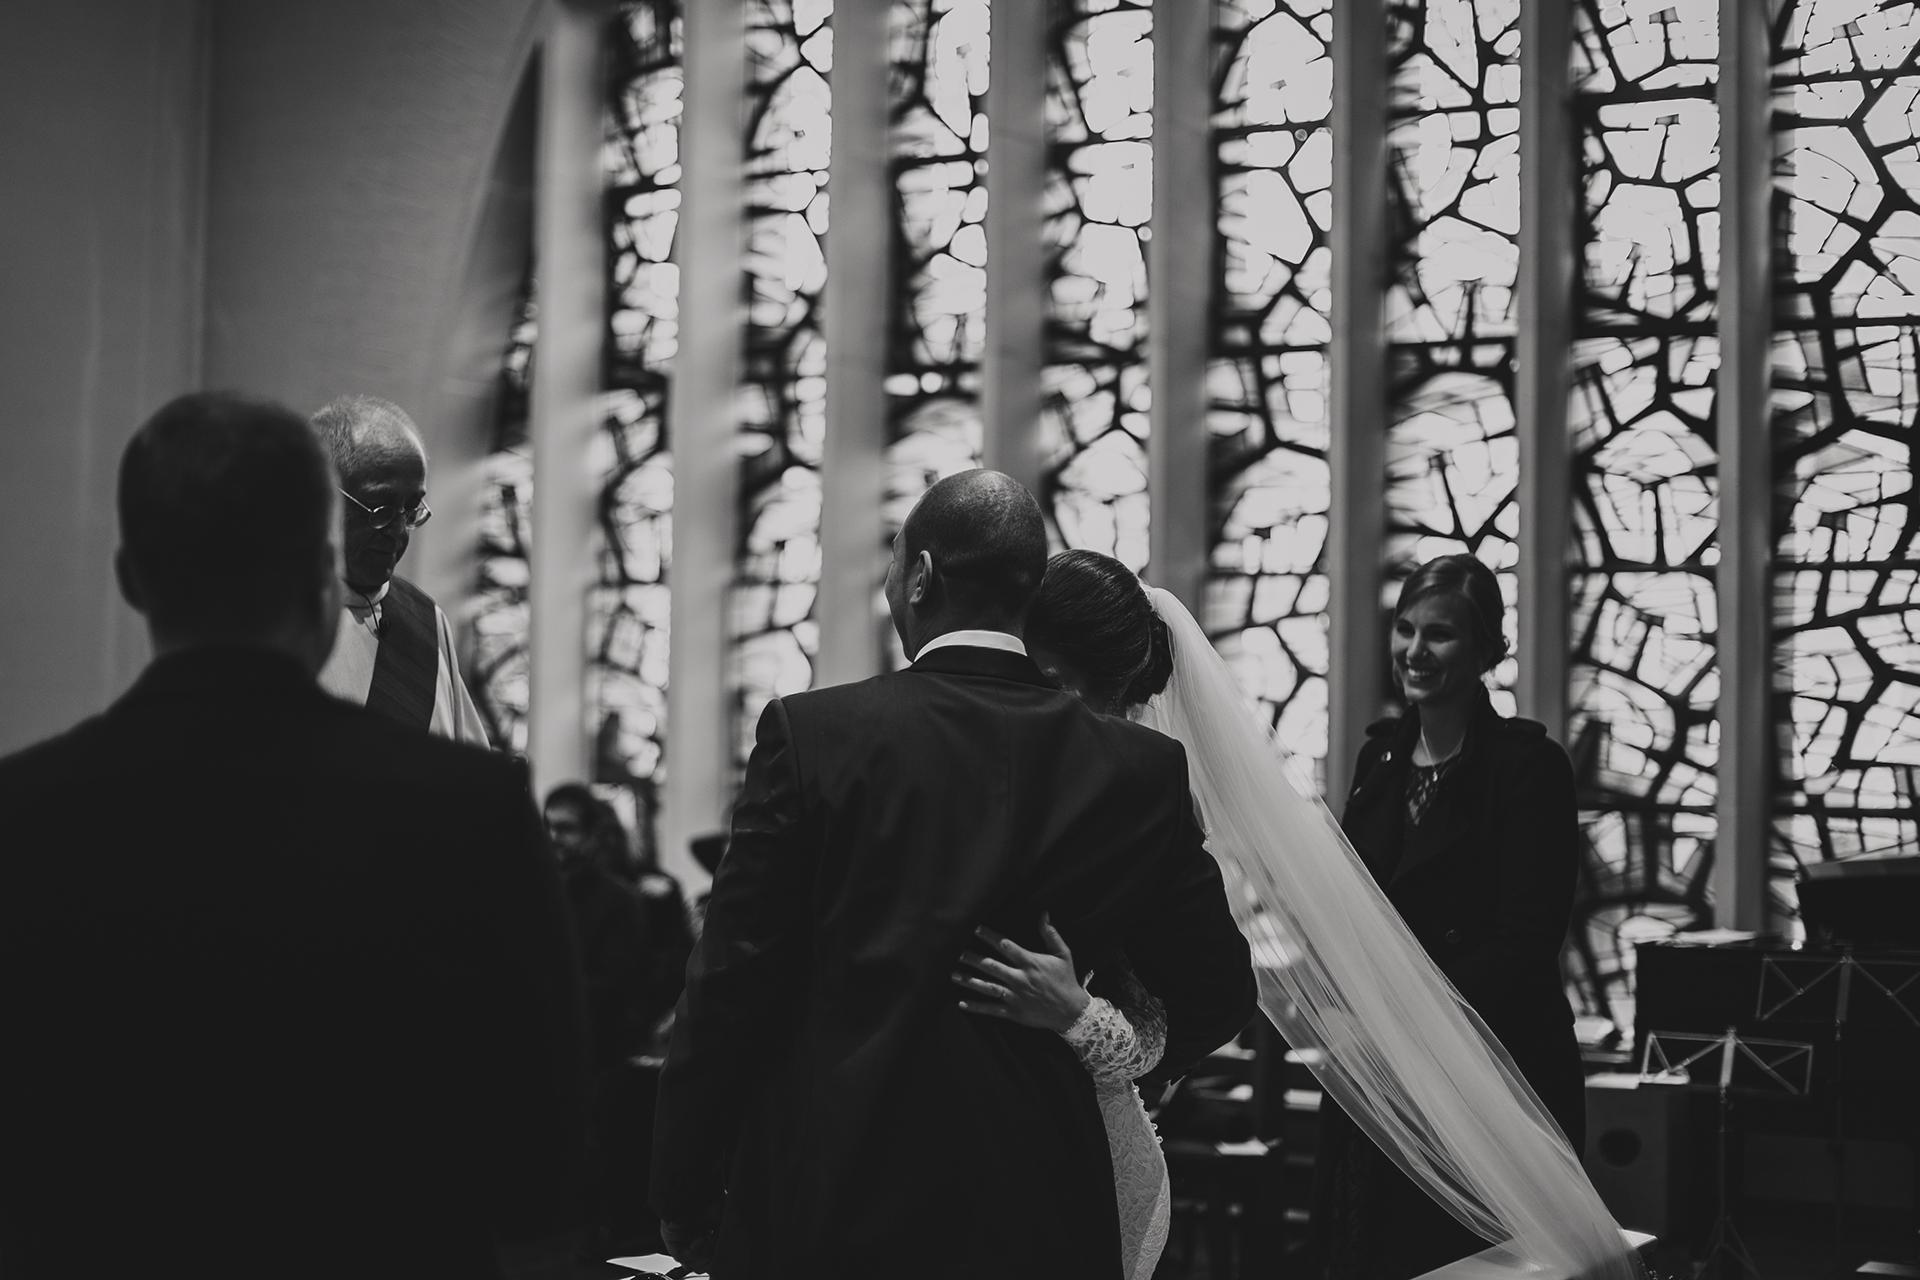 Hochzeitsreportage_J&D_029_Caroline Queda Fotografie